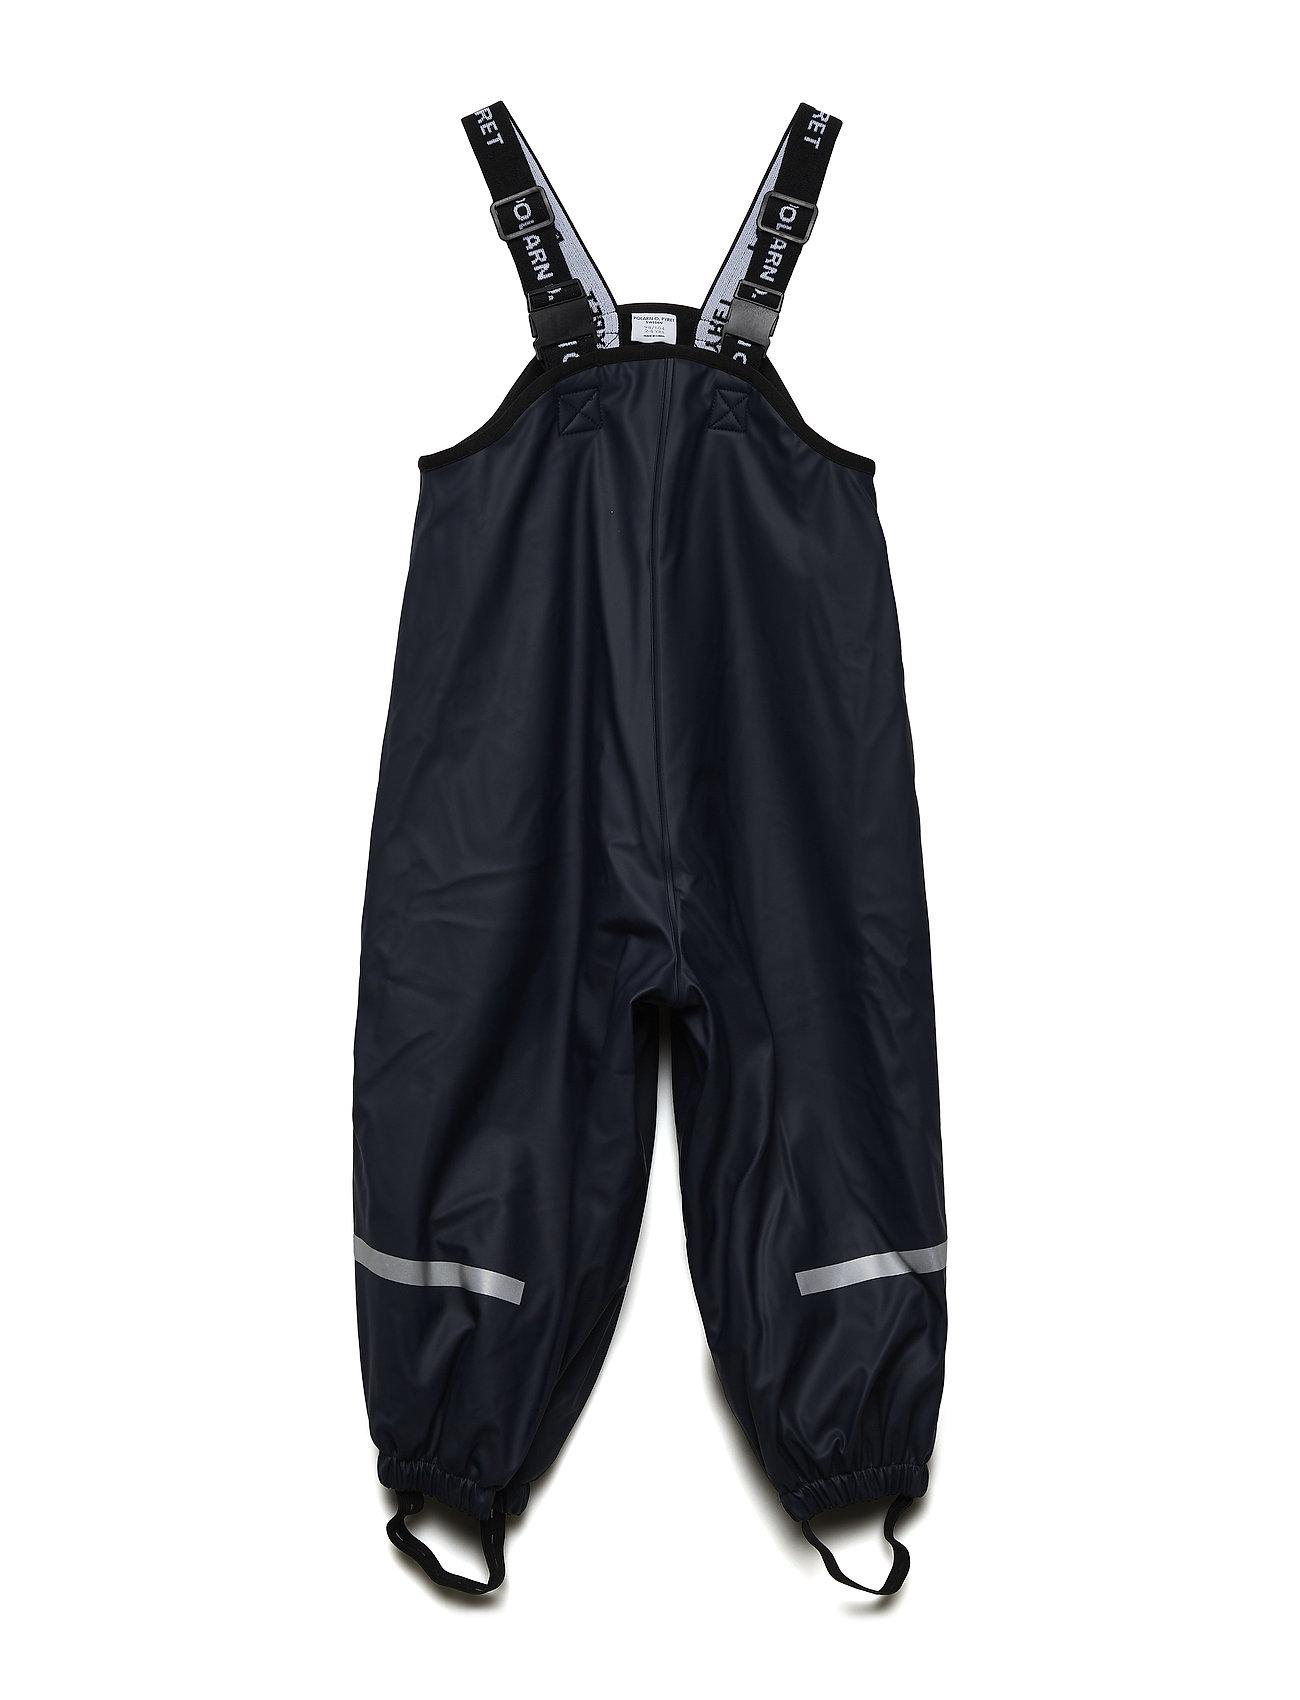 Polarn O. Pyret Rain Pants Preschool